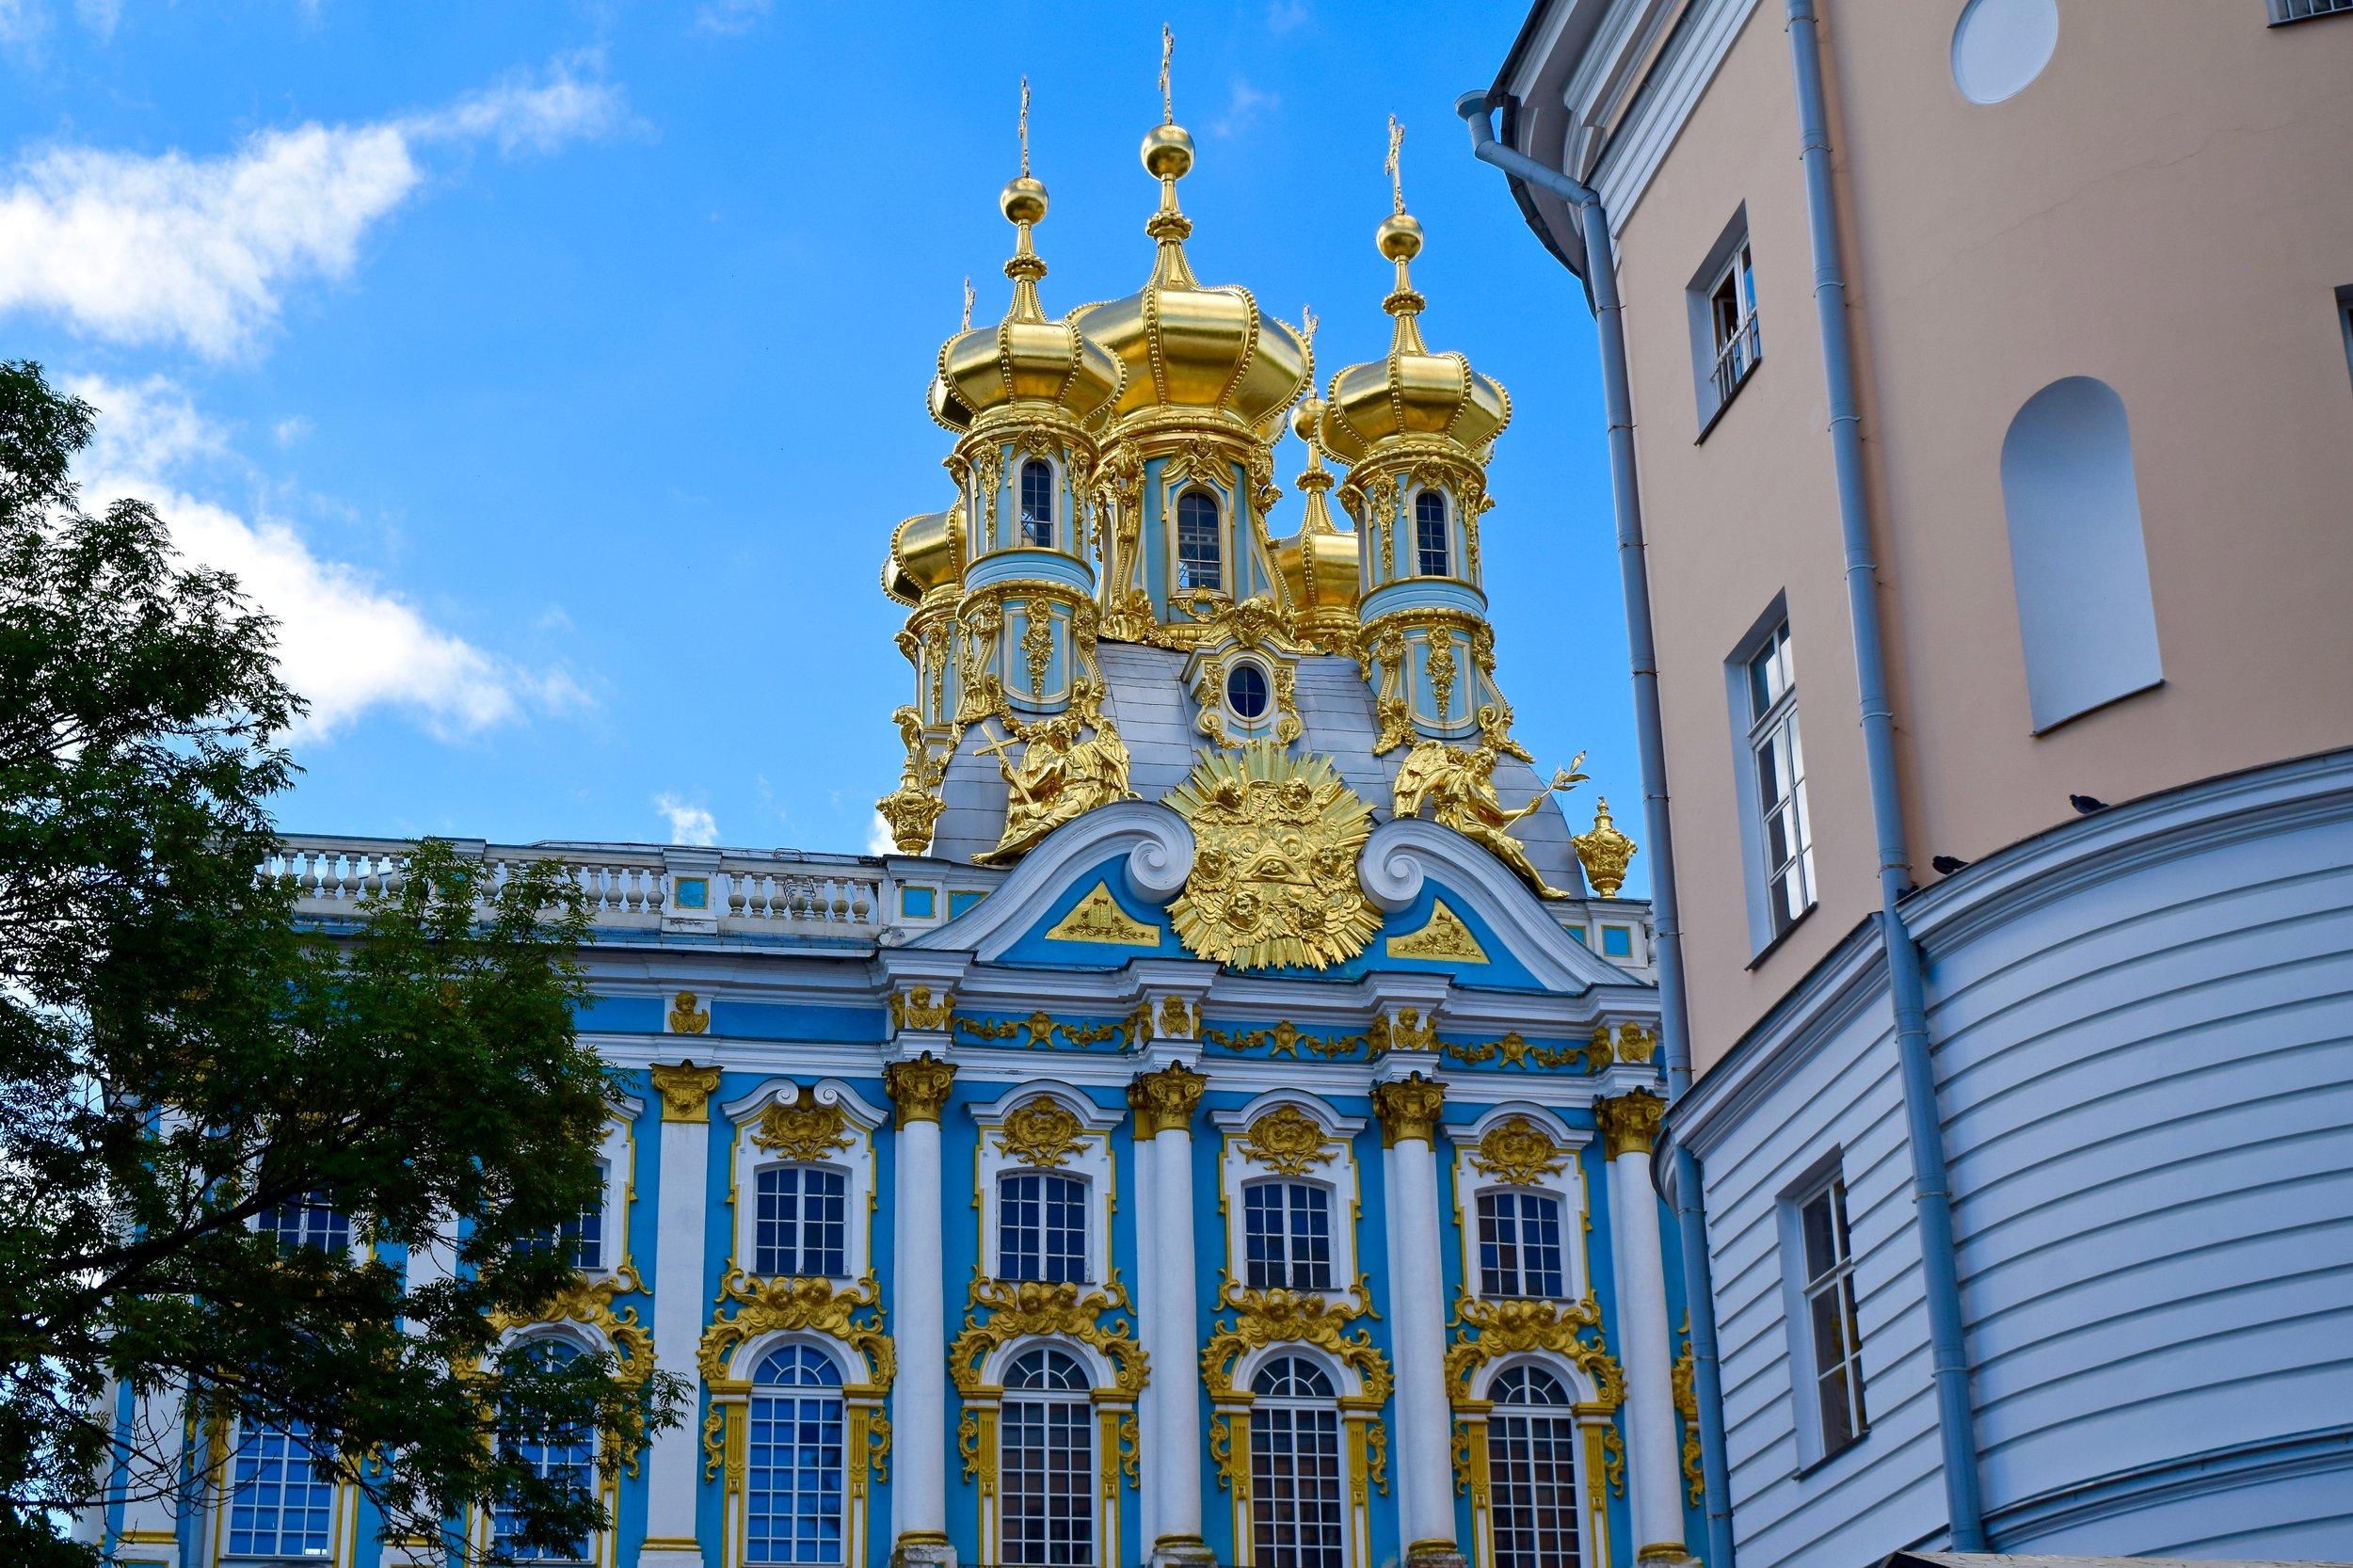 Entrance to Catherine Palace